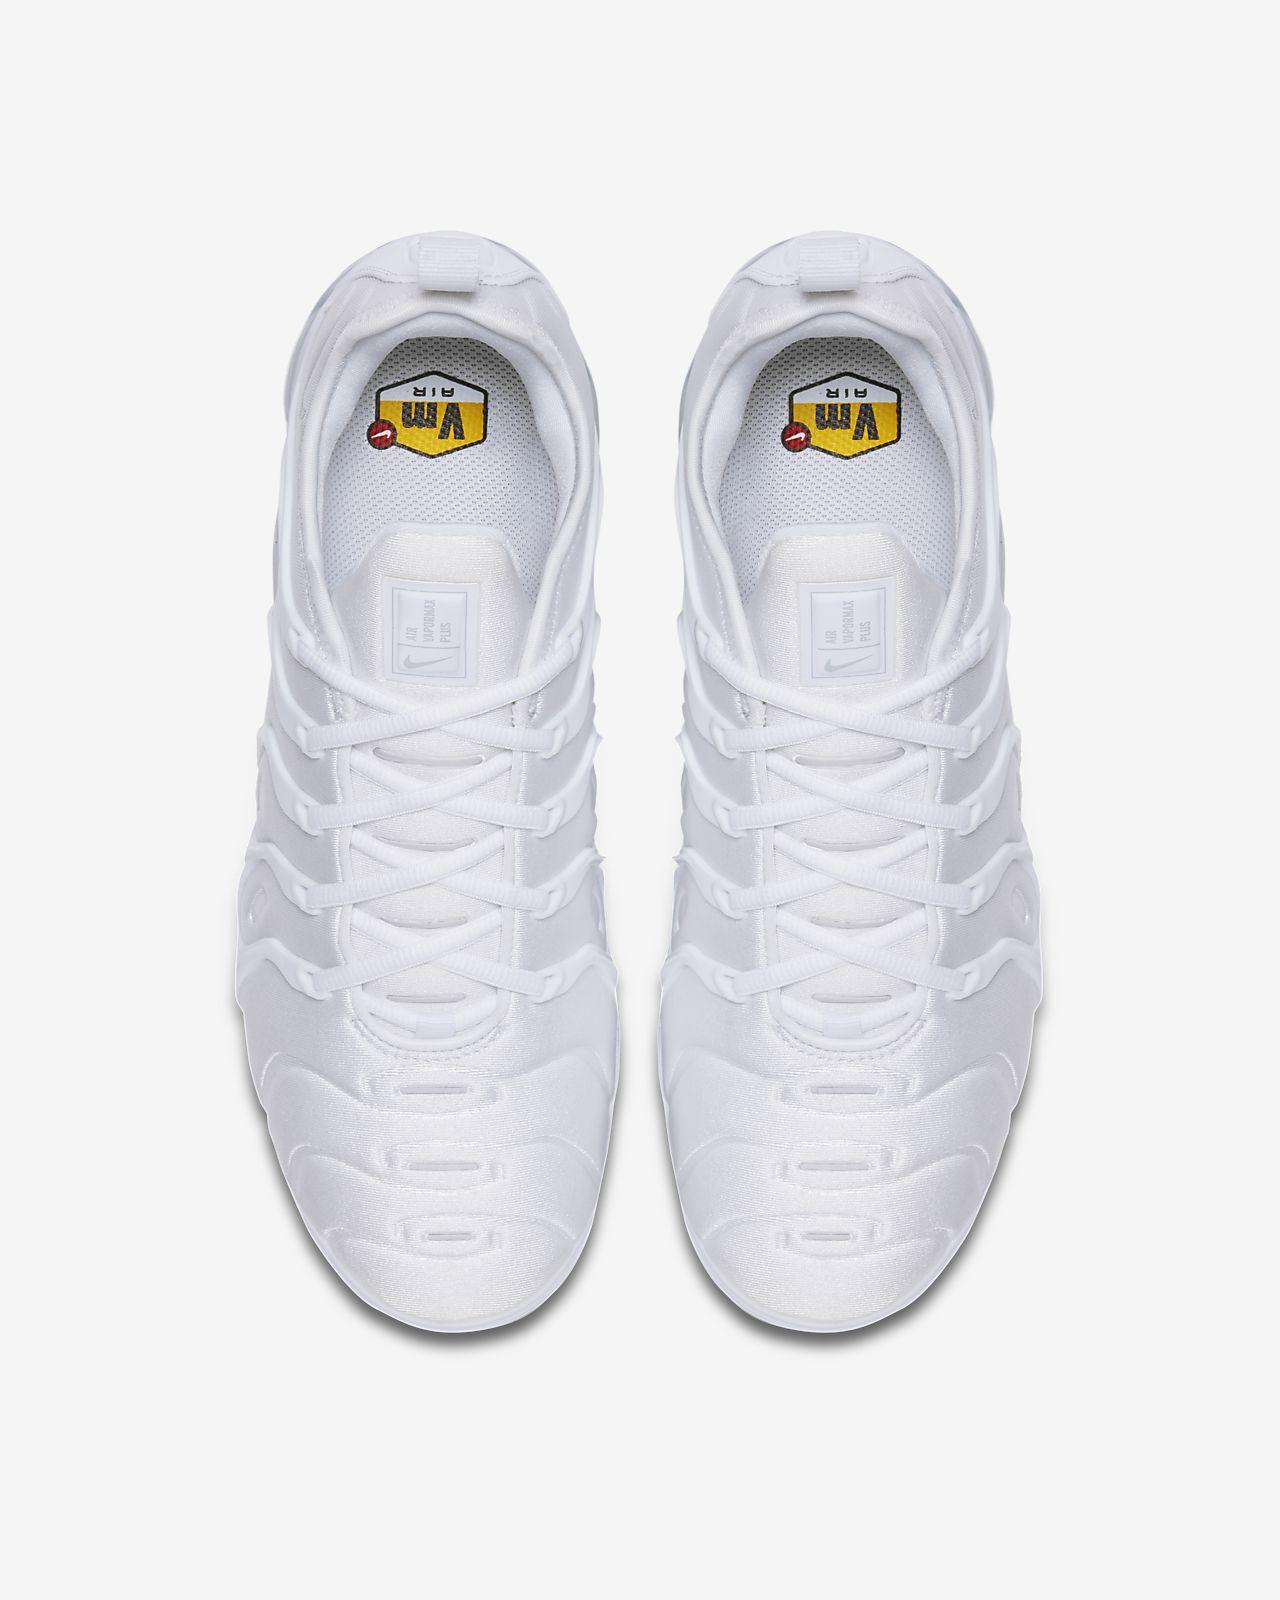 Nike Air Vapormax Plus WhiteWhite Pure Platinum 924453 100